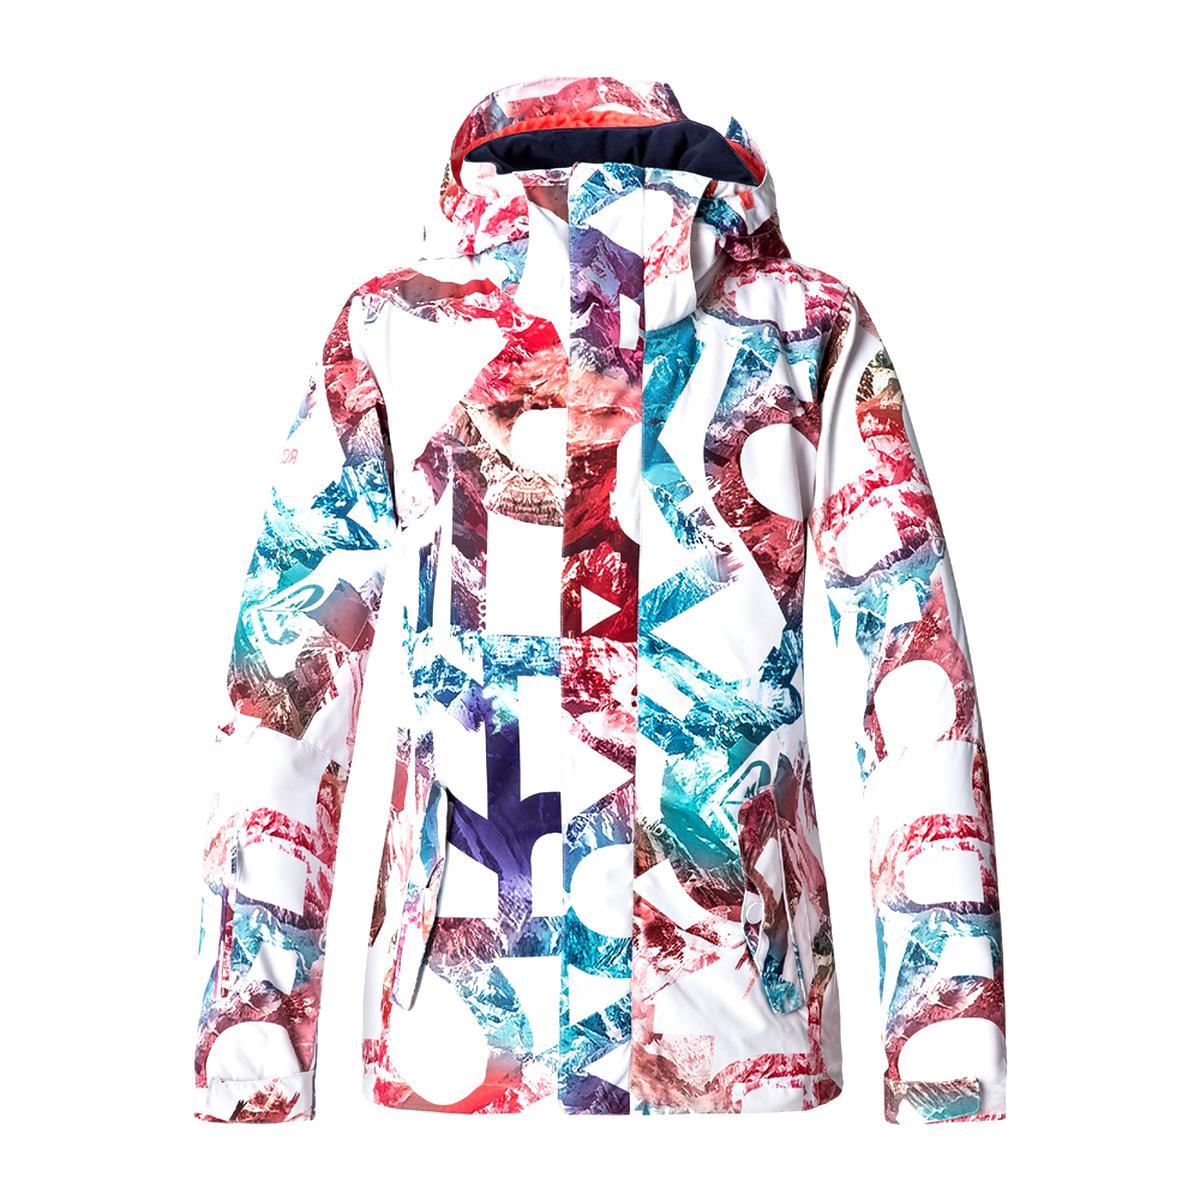 veste ski roxy d'occasion